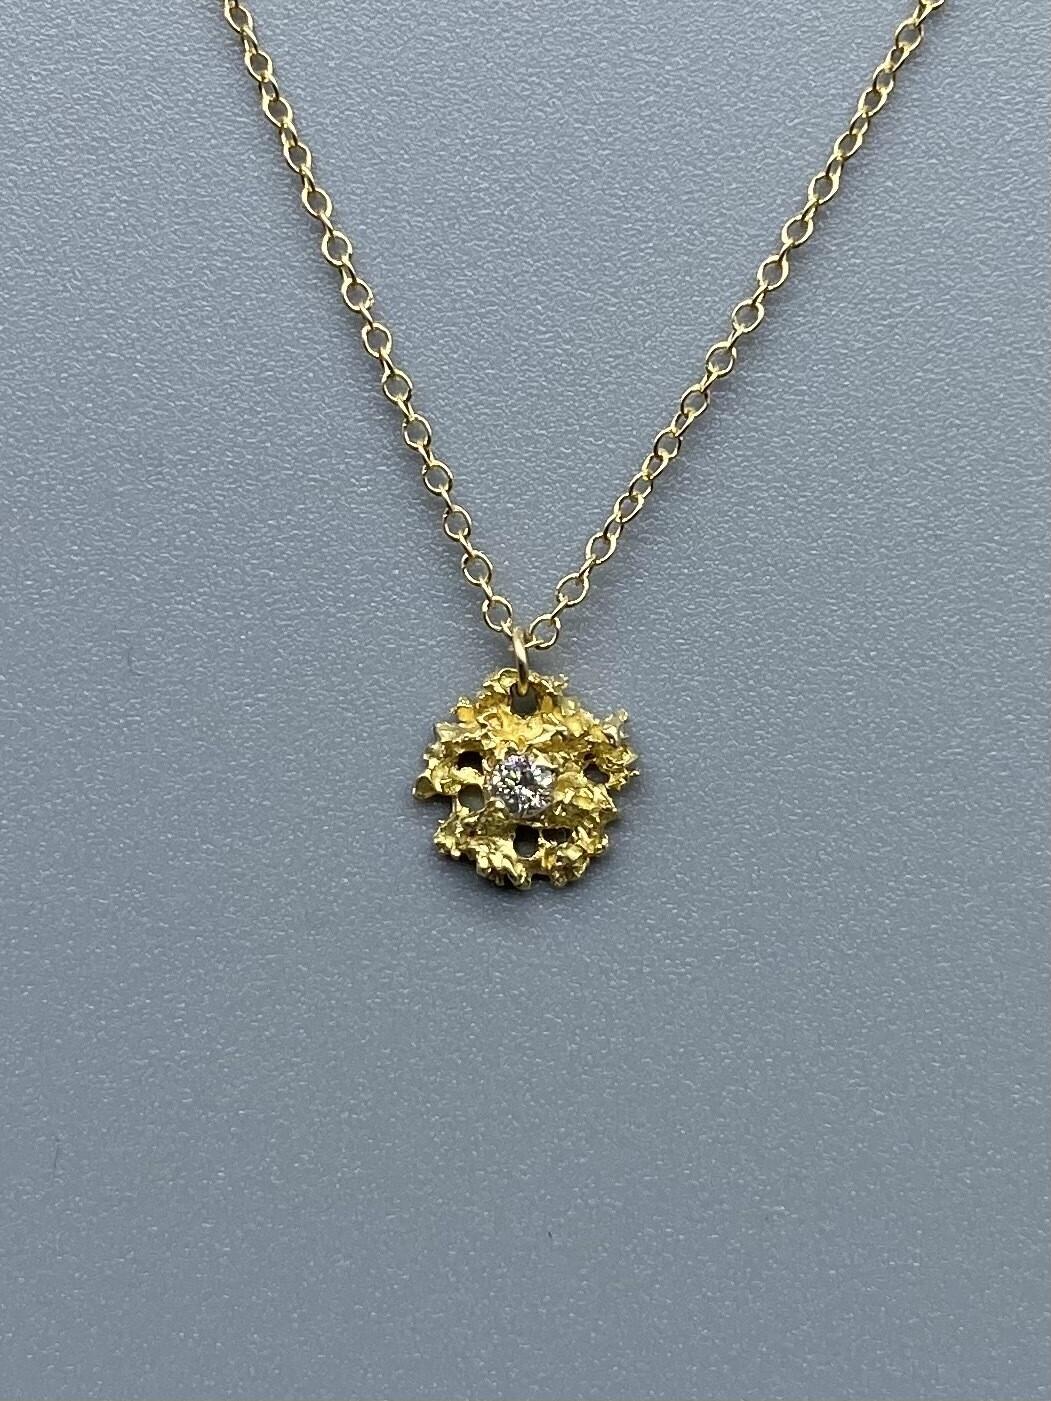 14k Star Pendant w/Diamonds - Branch Jewelry - Venice CA